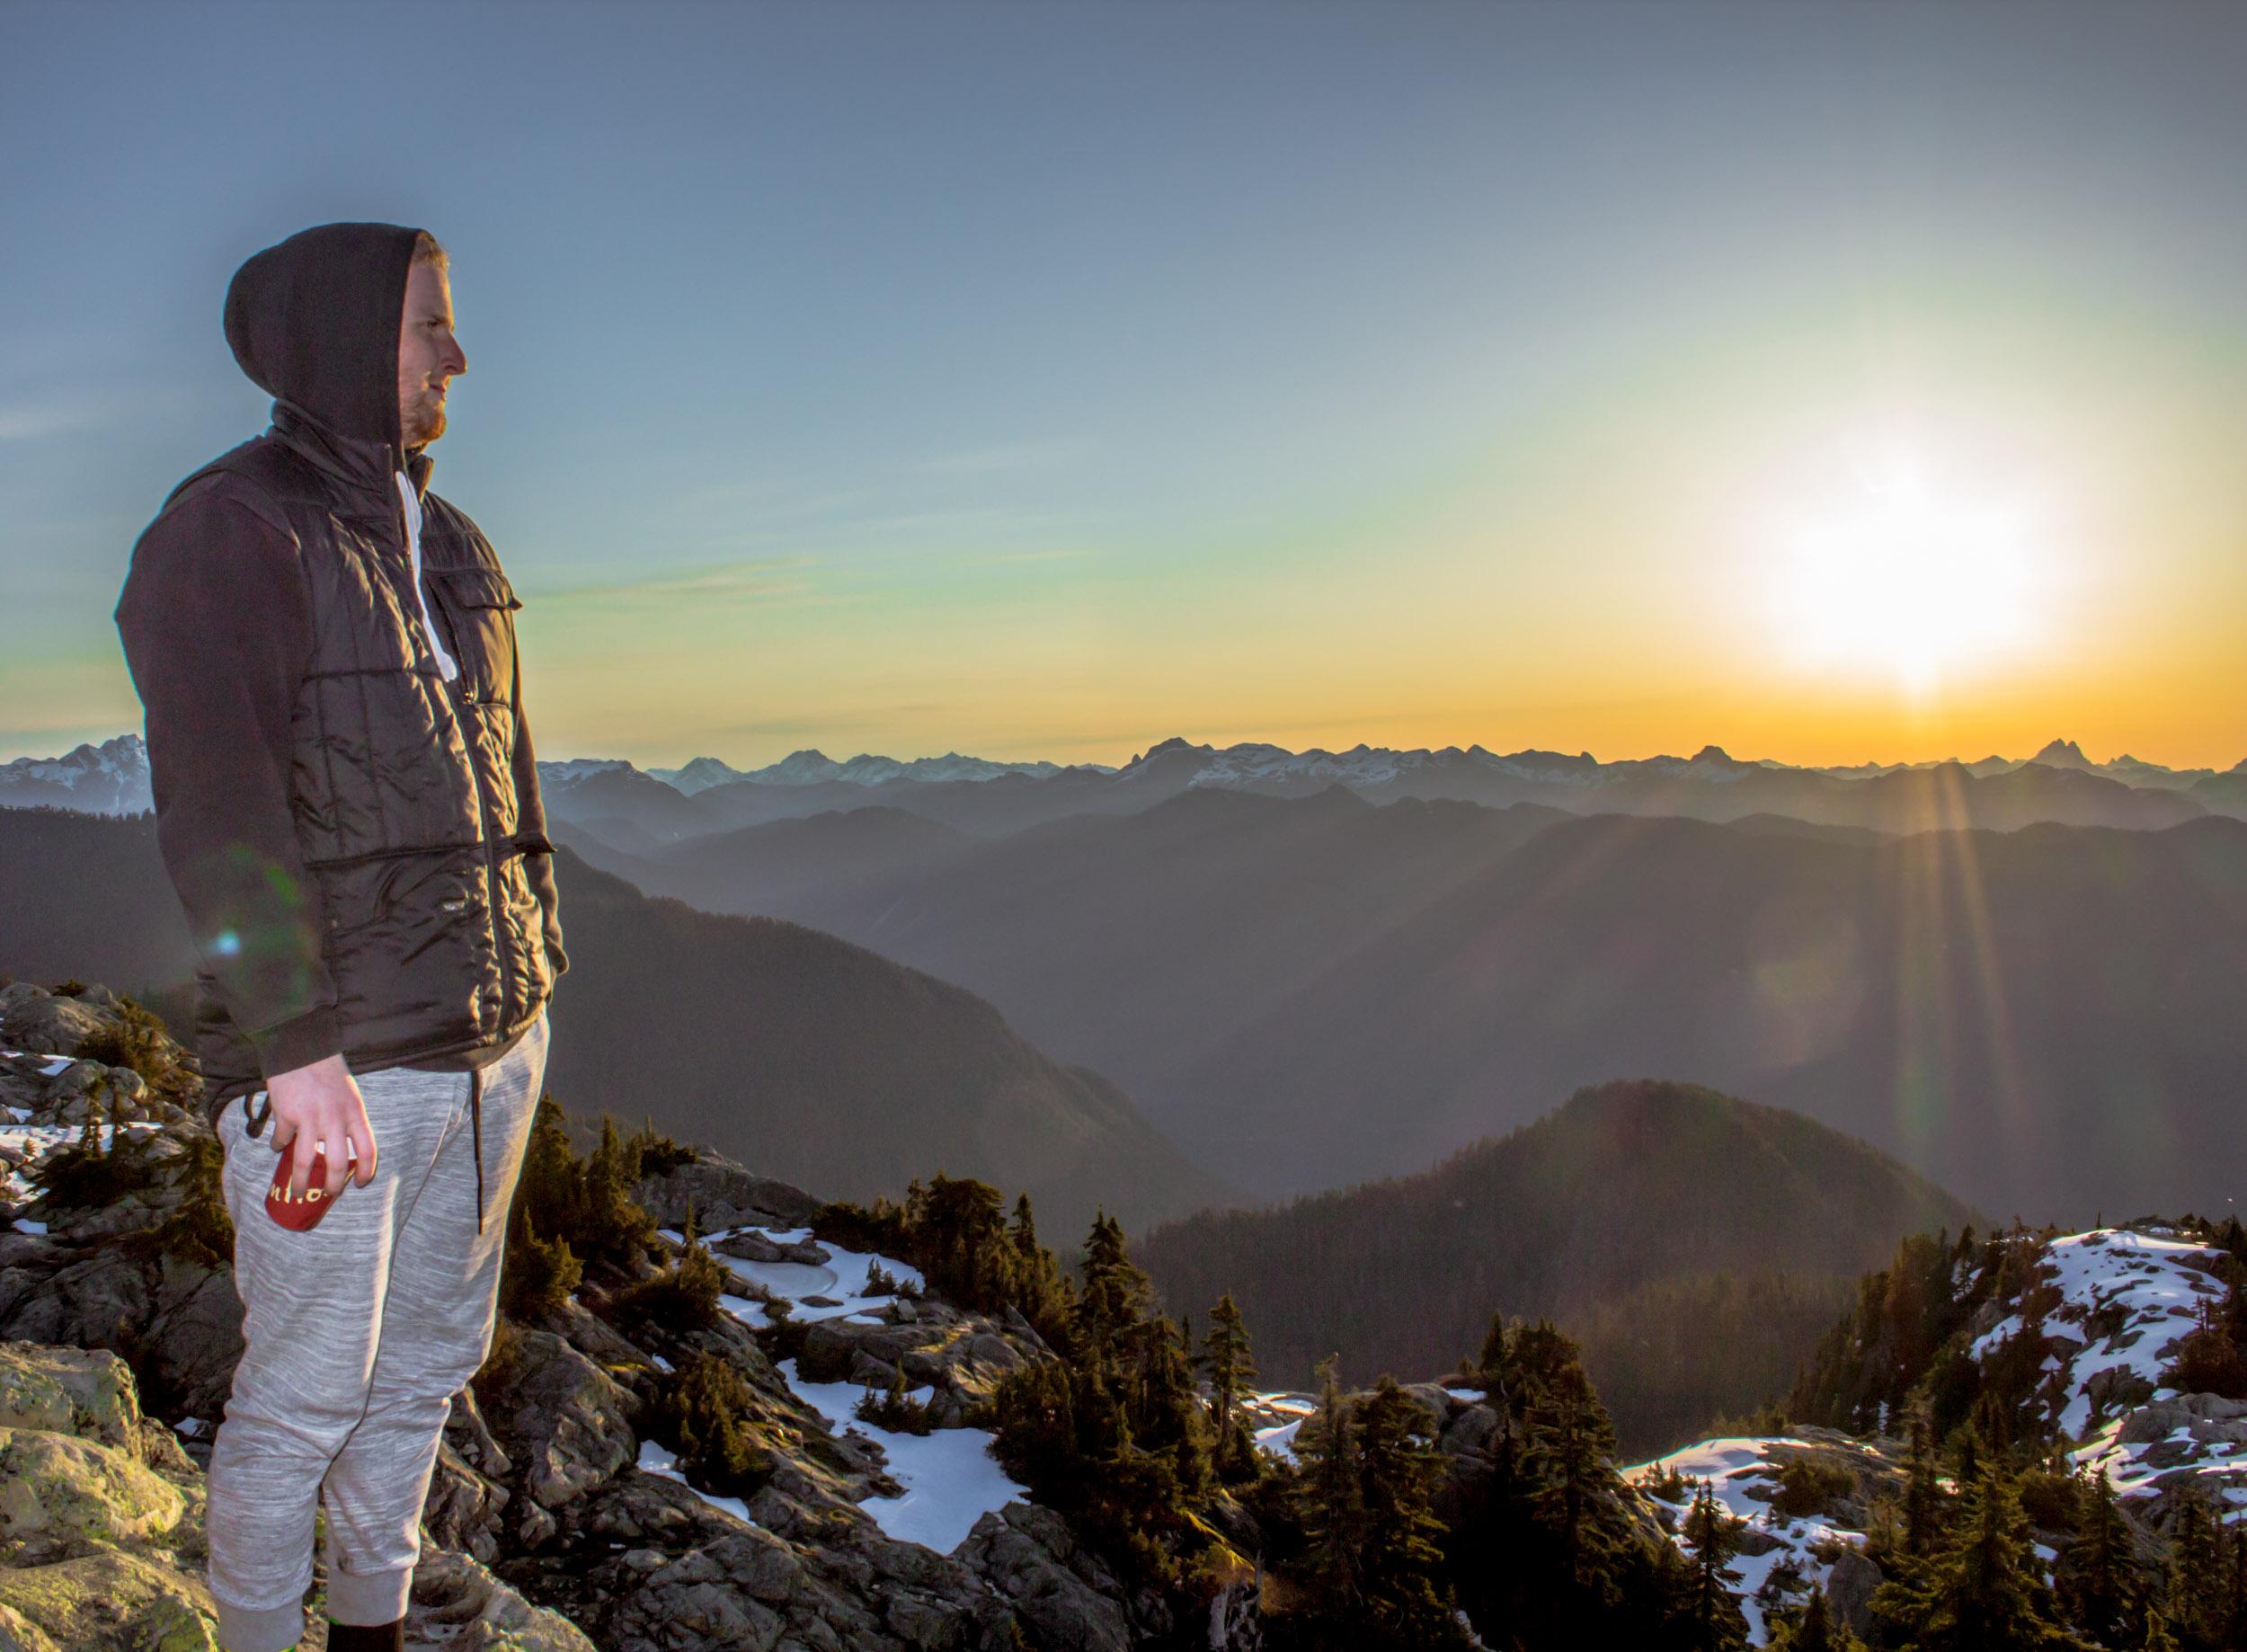 20150507 - Chasing Sunrise-35.jpg